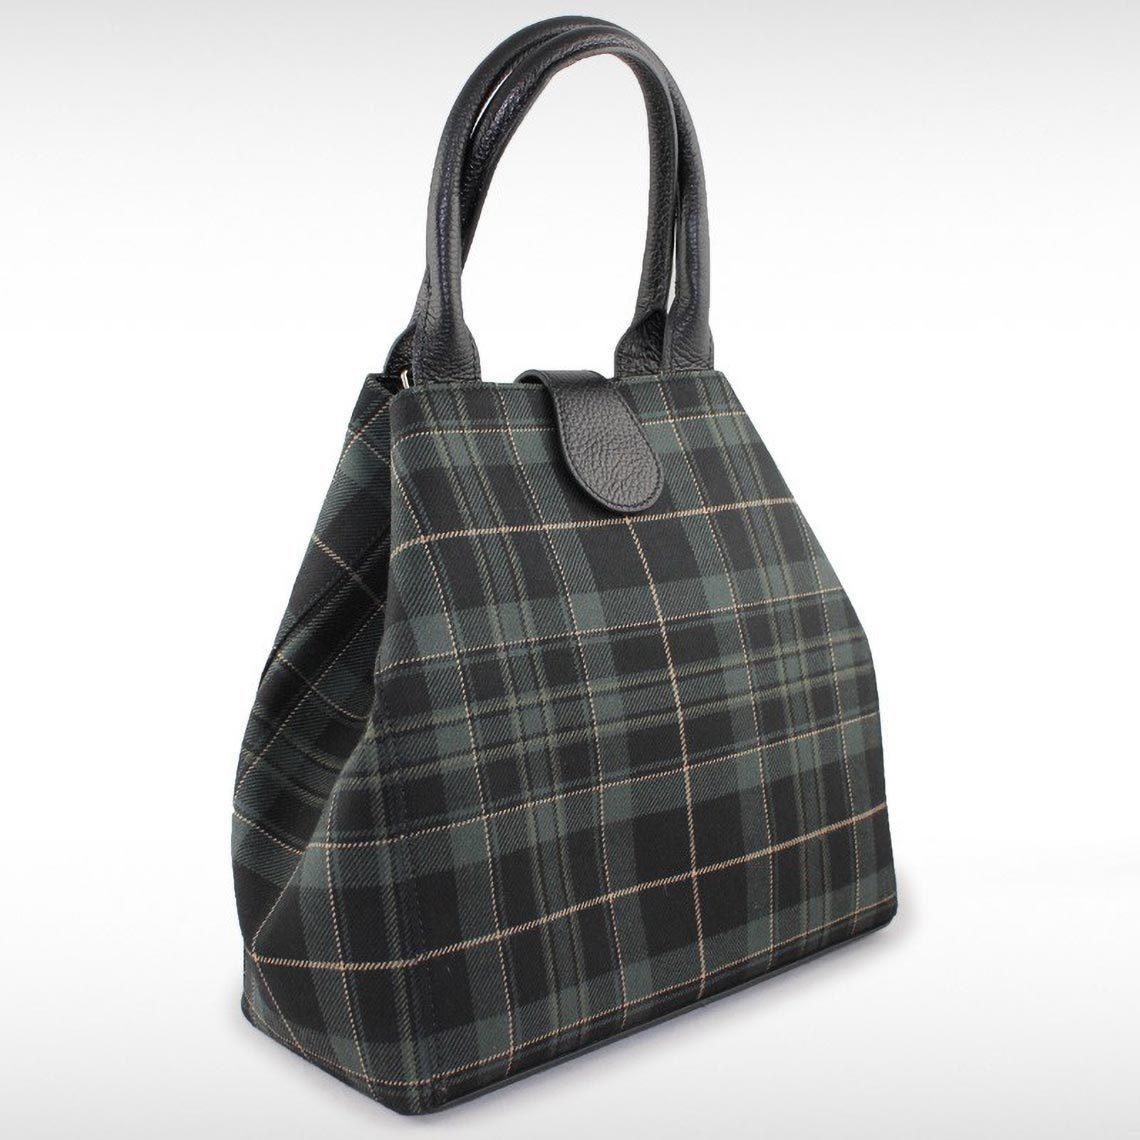 Zara Hunting Pride Bucket Bag